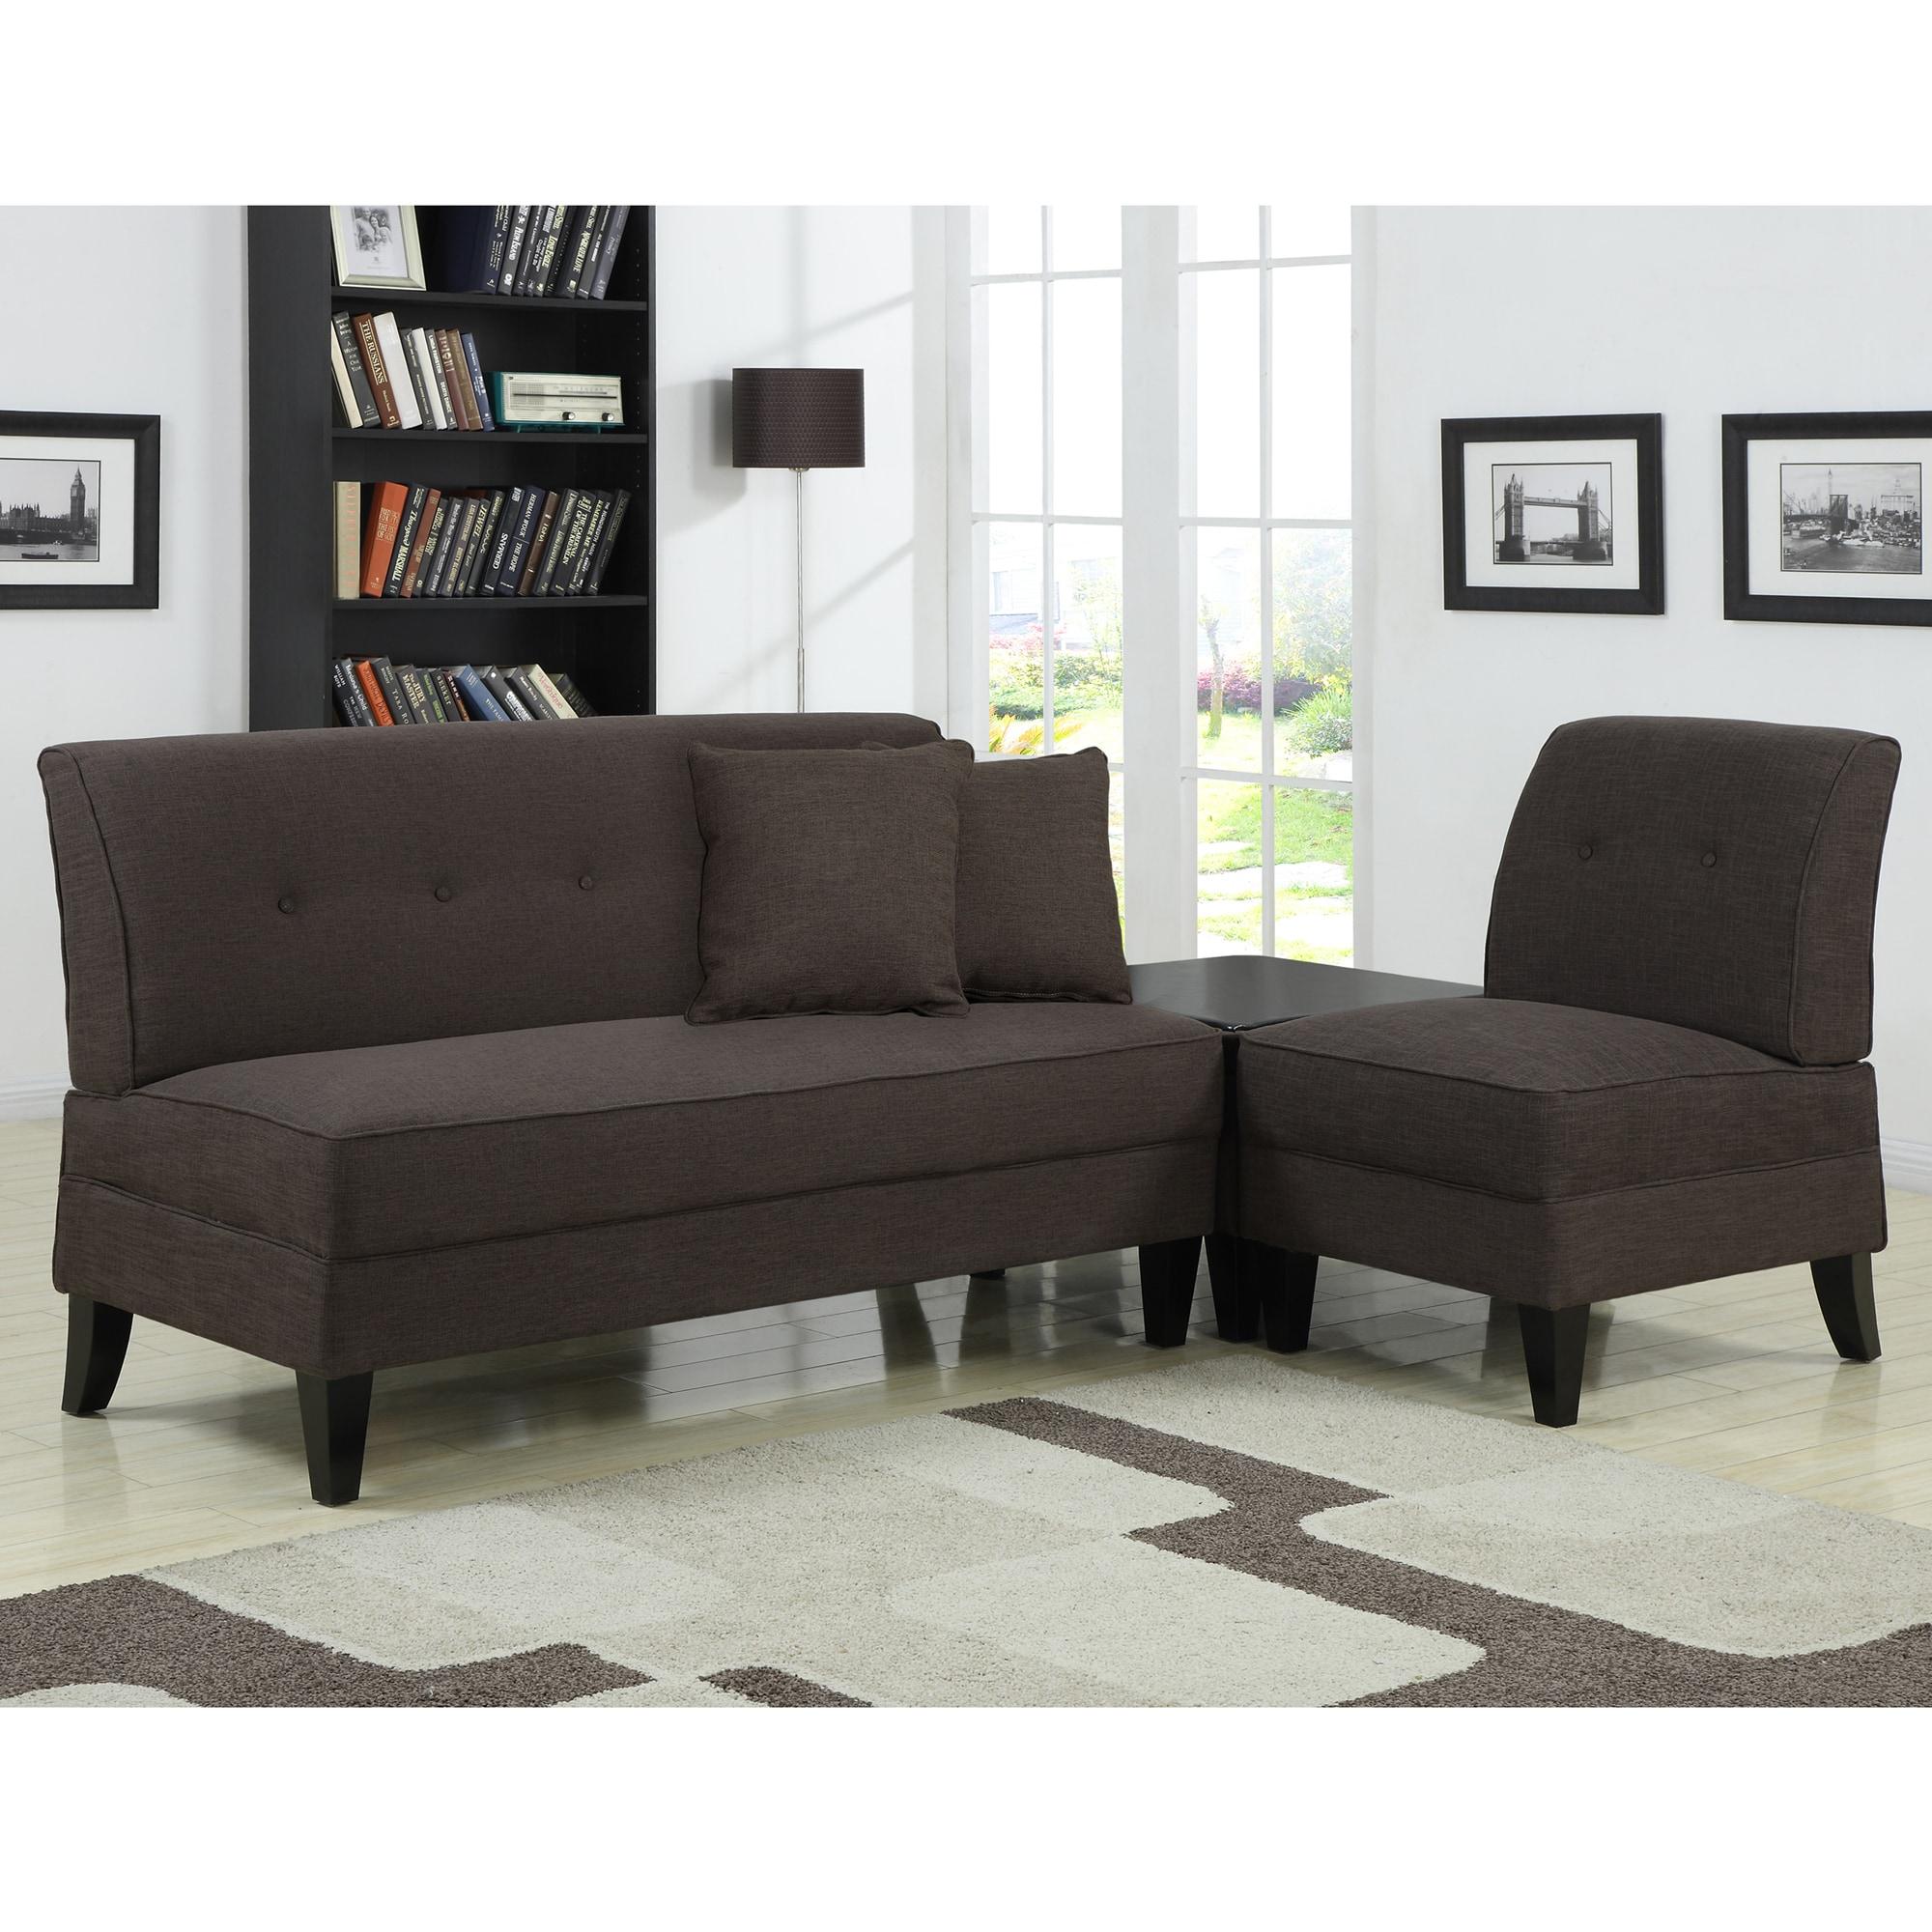 Portfolio Engle Chocolate Brown Linen 3-piece Sofa Set